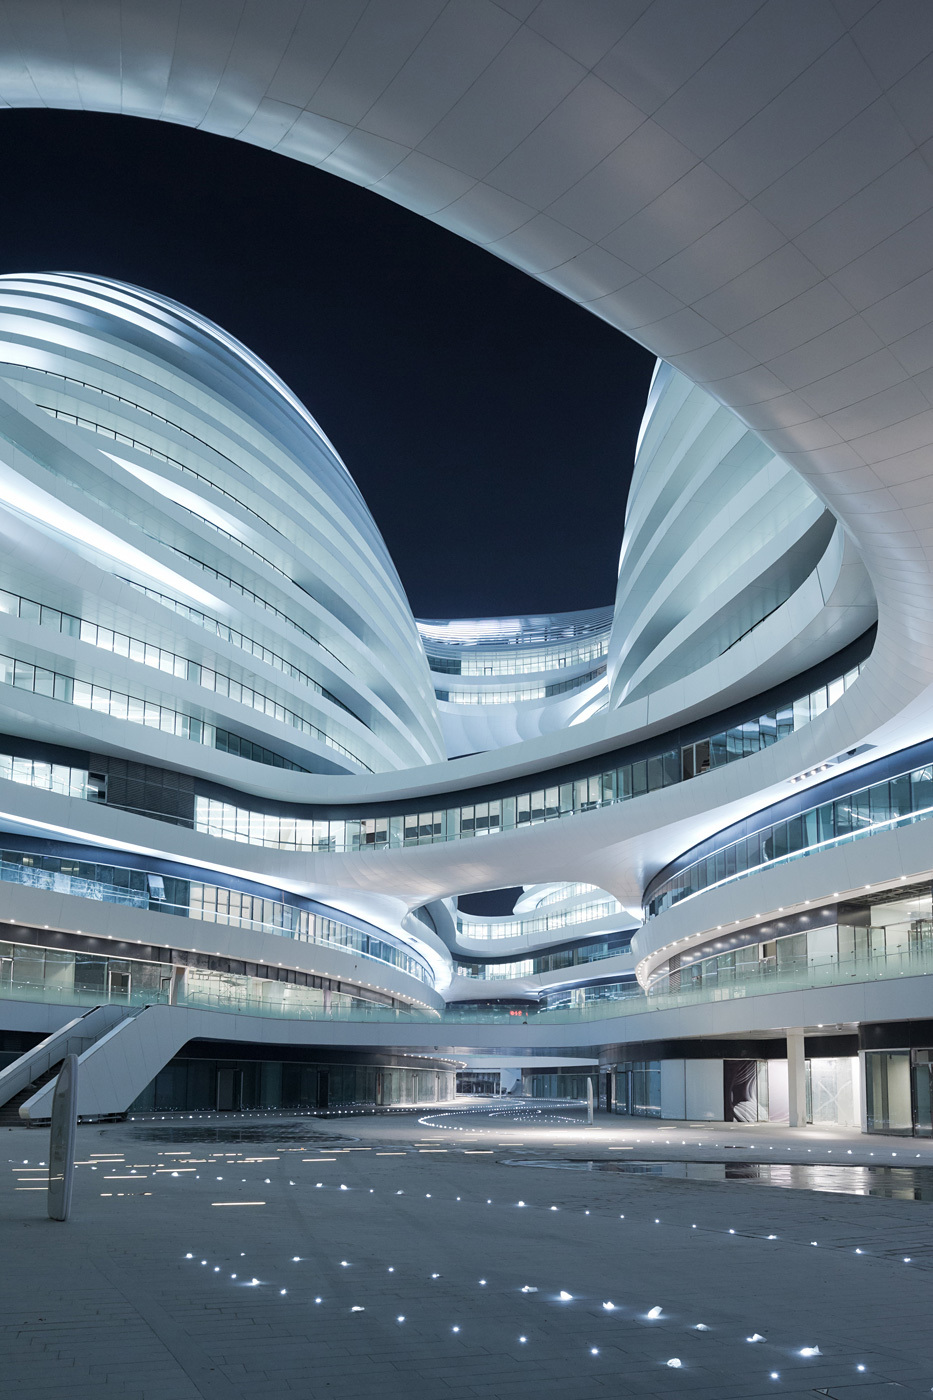 Galaxy Soho, Beijing, China by Zaha Hadid Architects; Photo: Iwan Baan